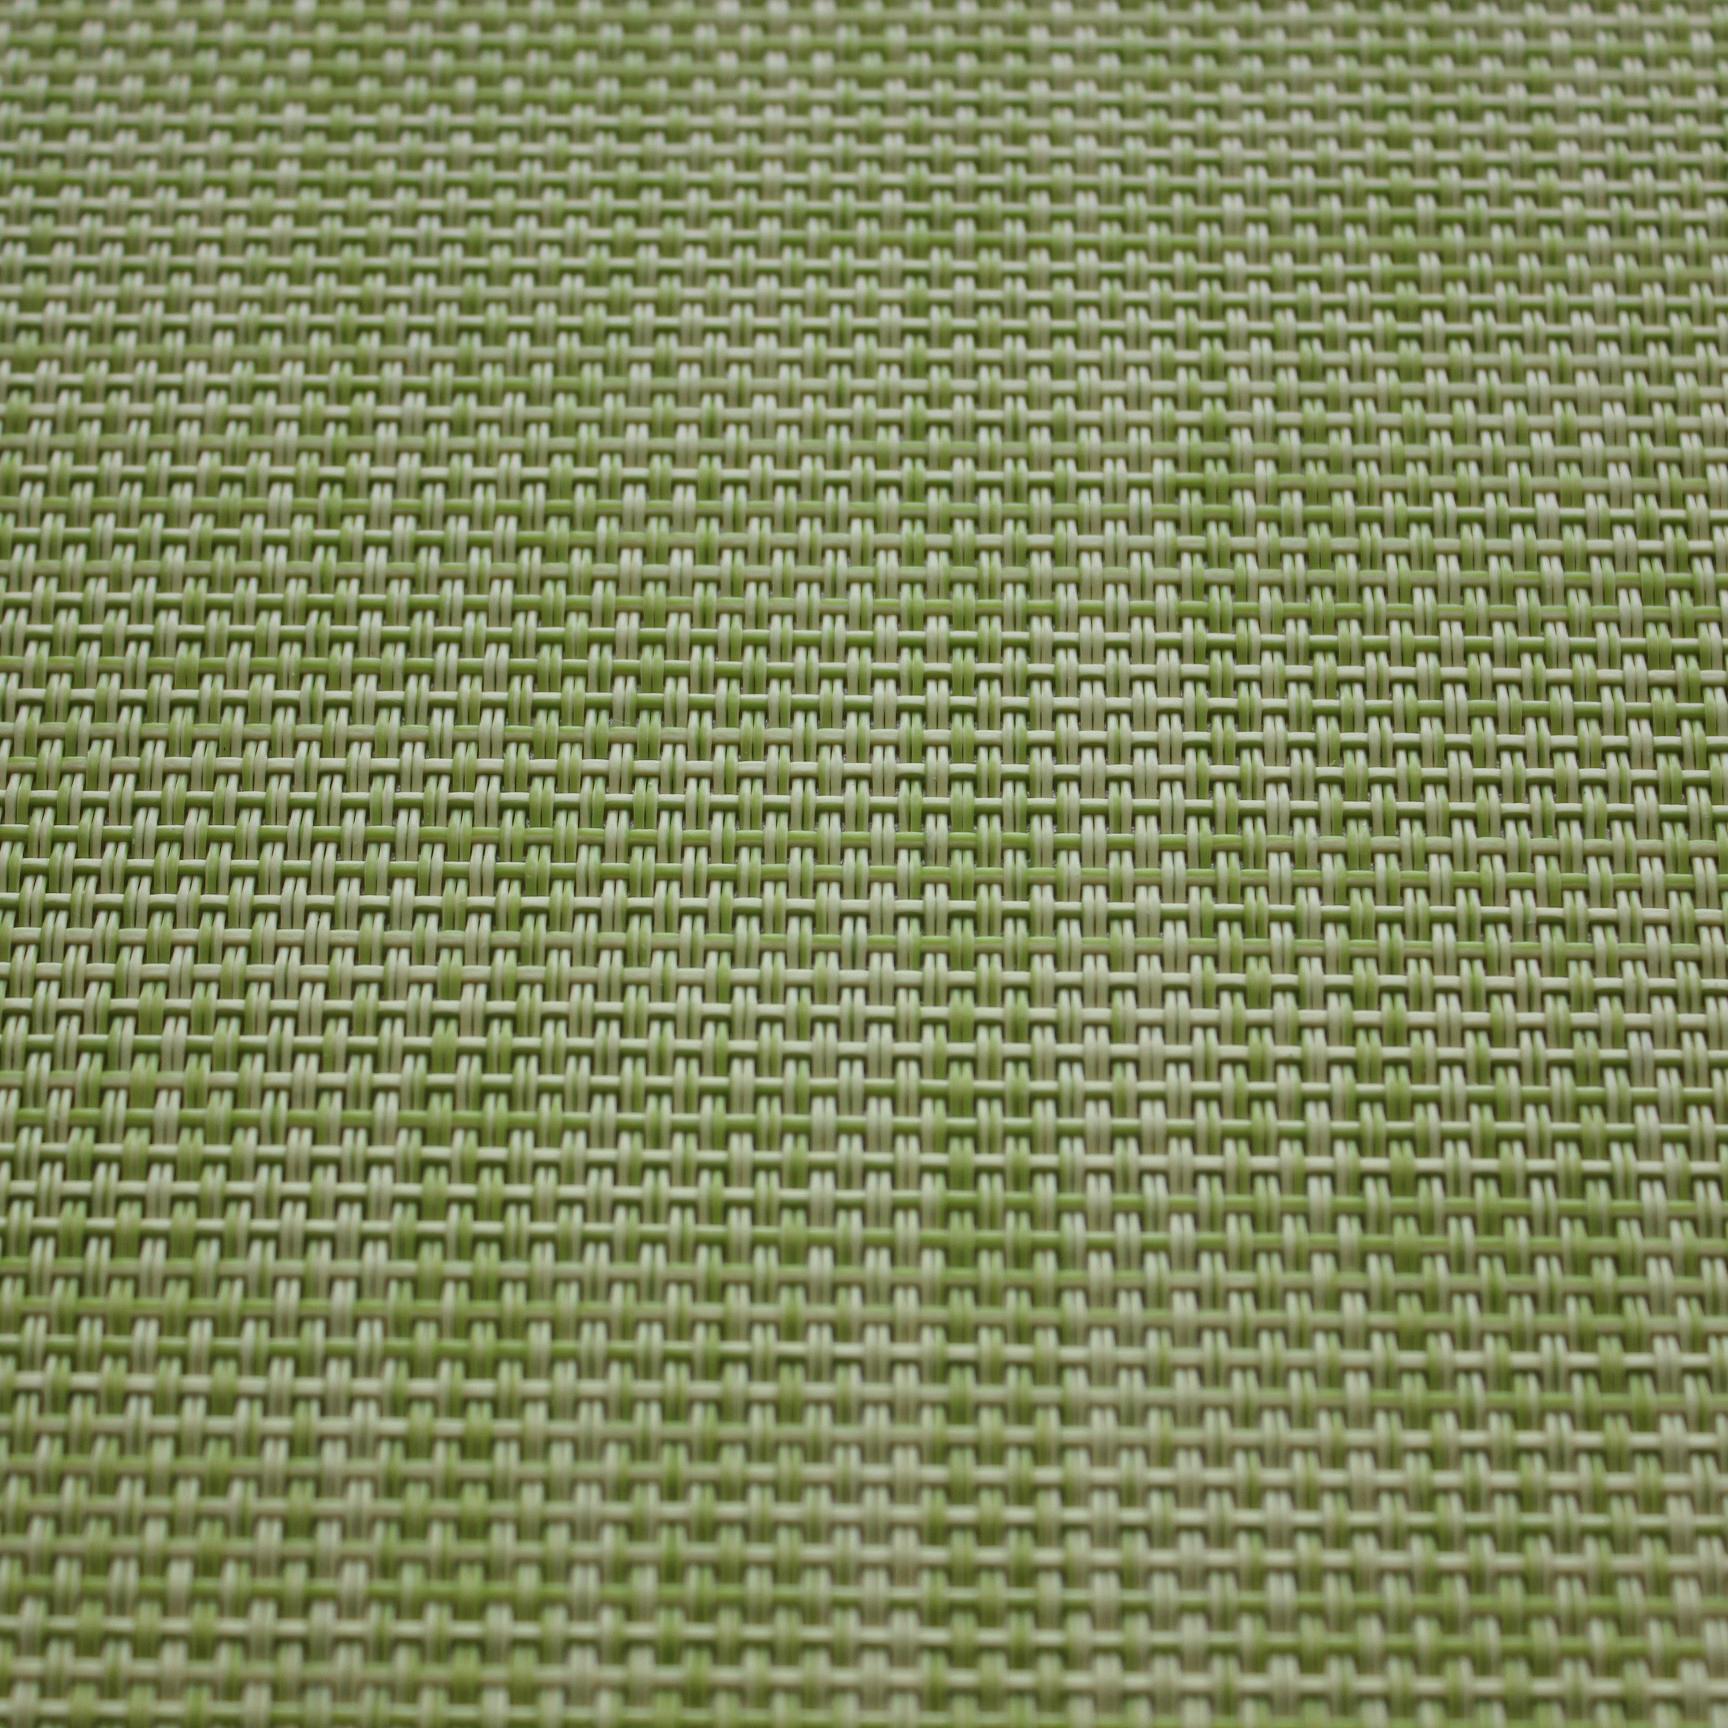 Pvc Woven Coated Fabric 21620 1